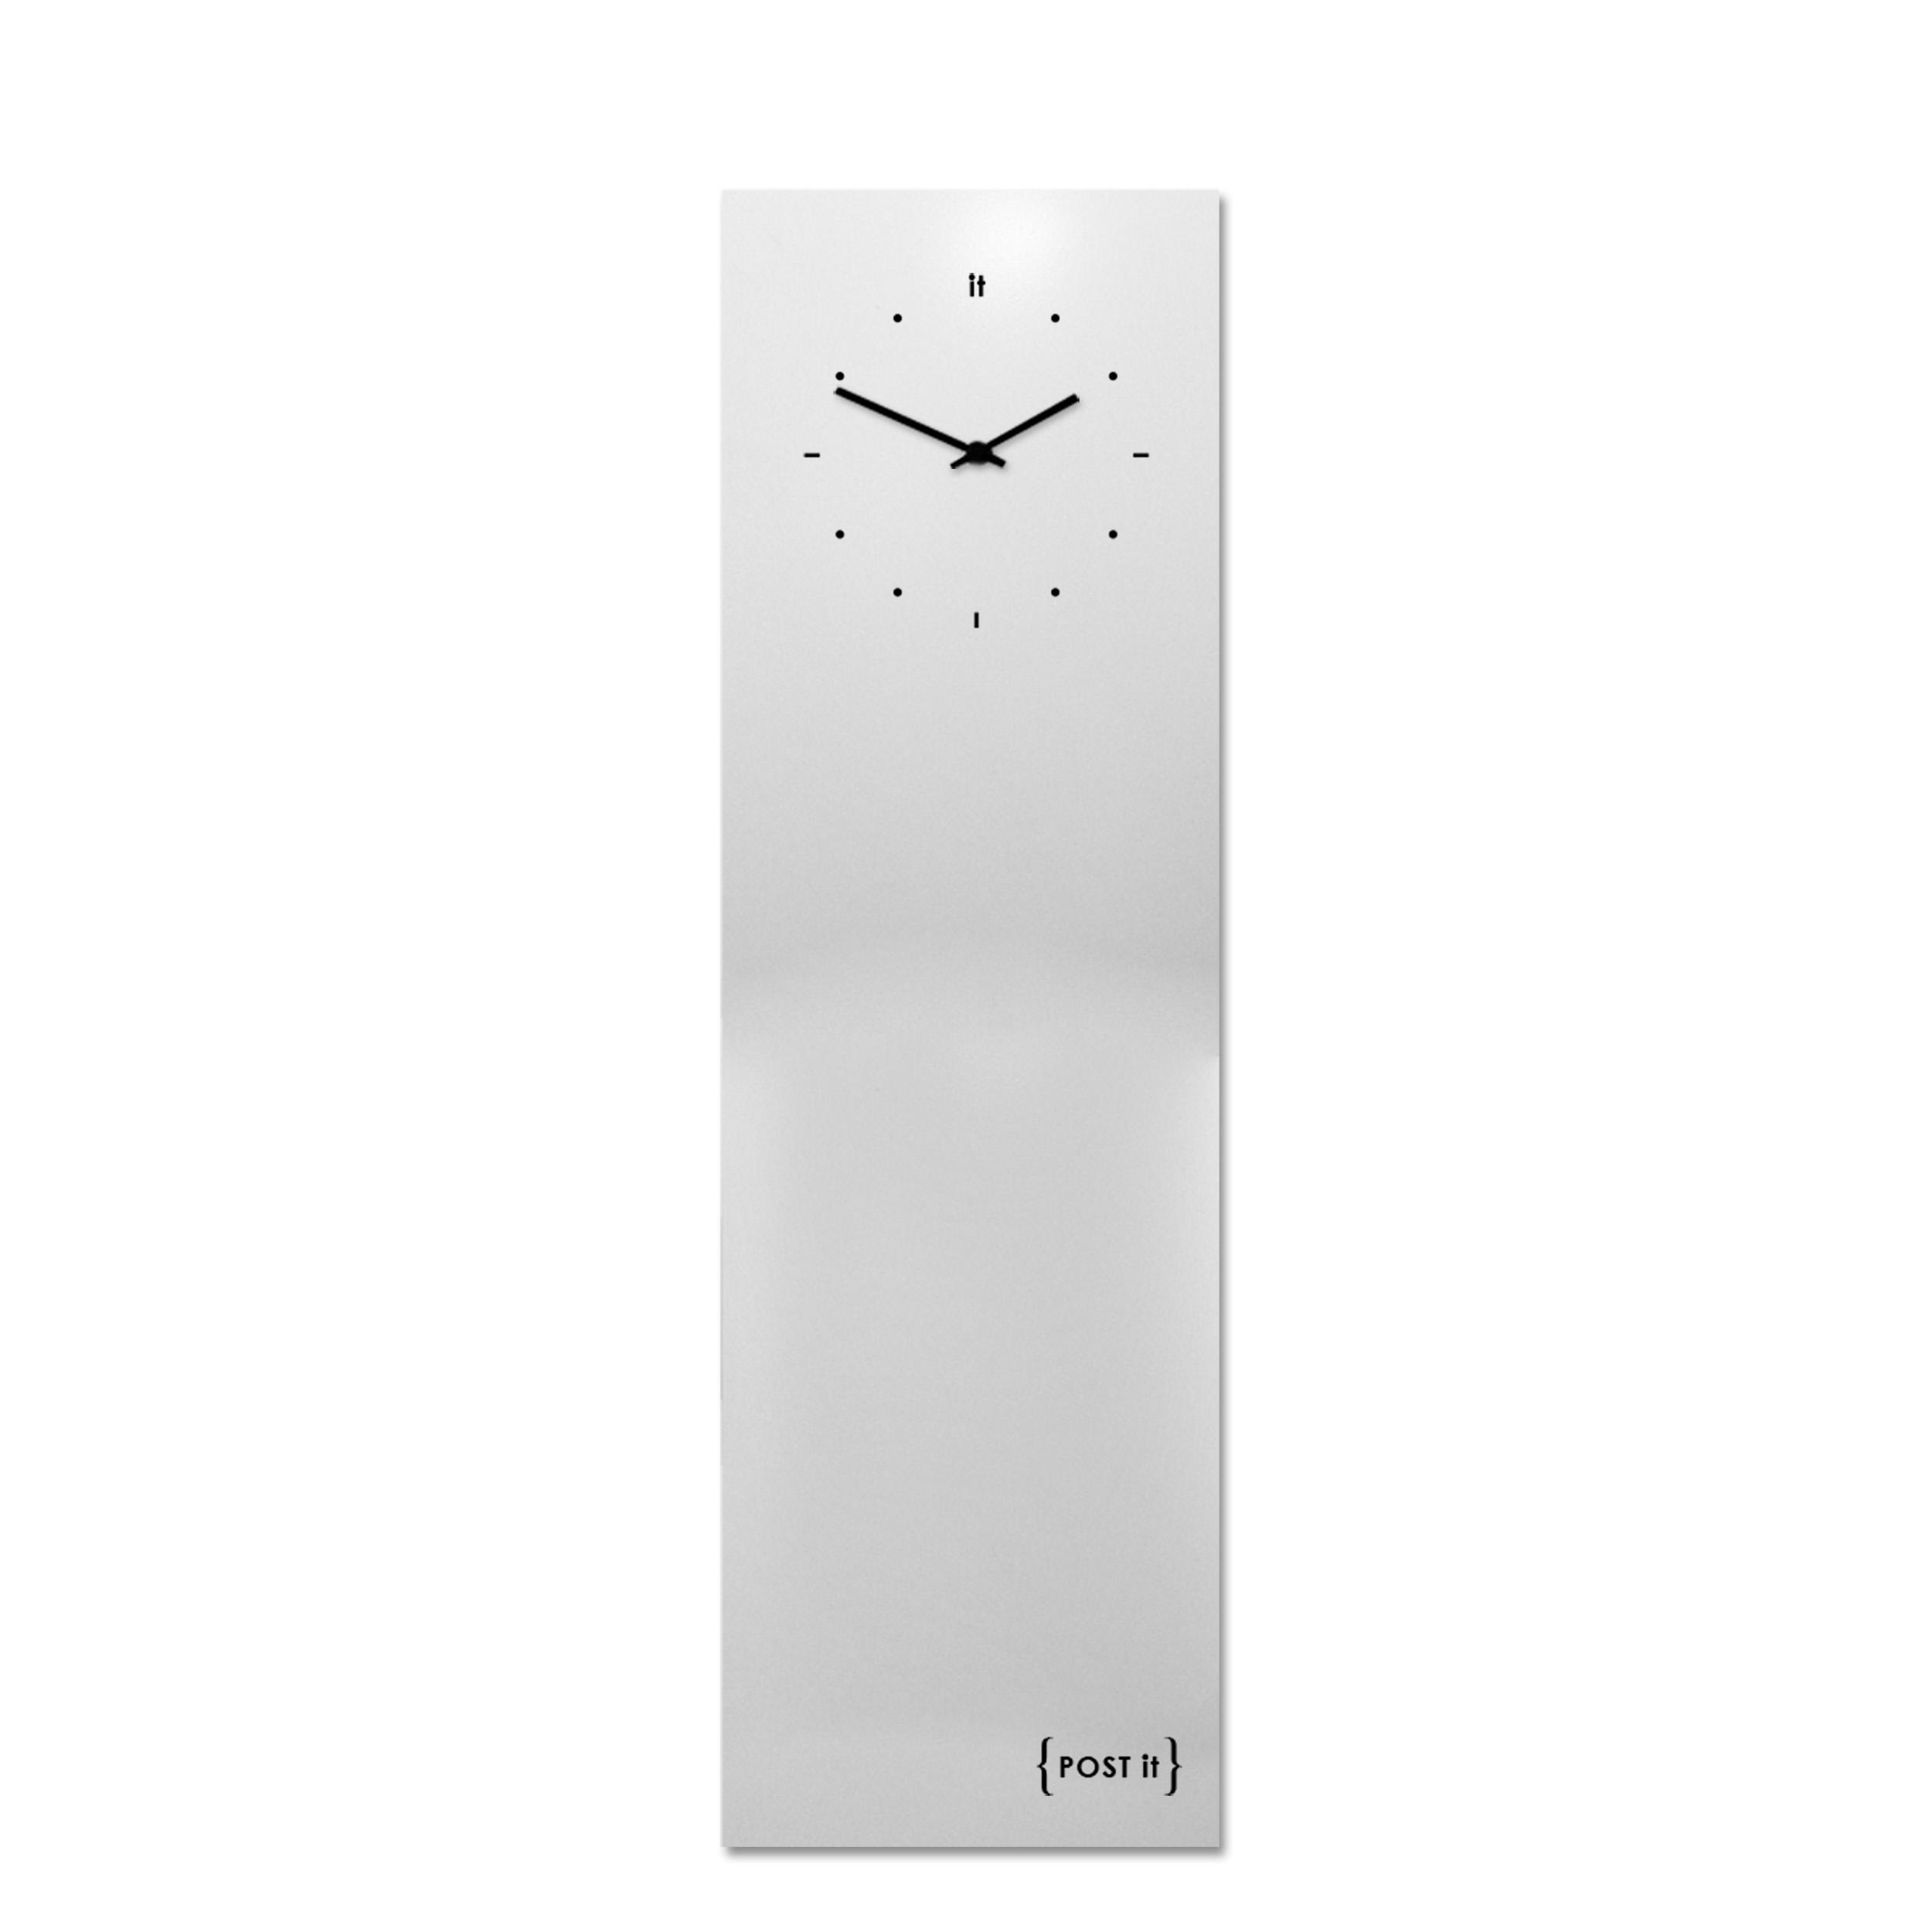 design-clock-magnetic-board-orologio-lavagna-magnetica-post it-white-vertical